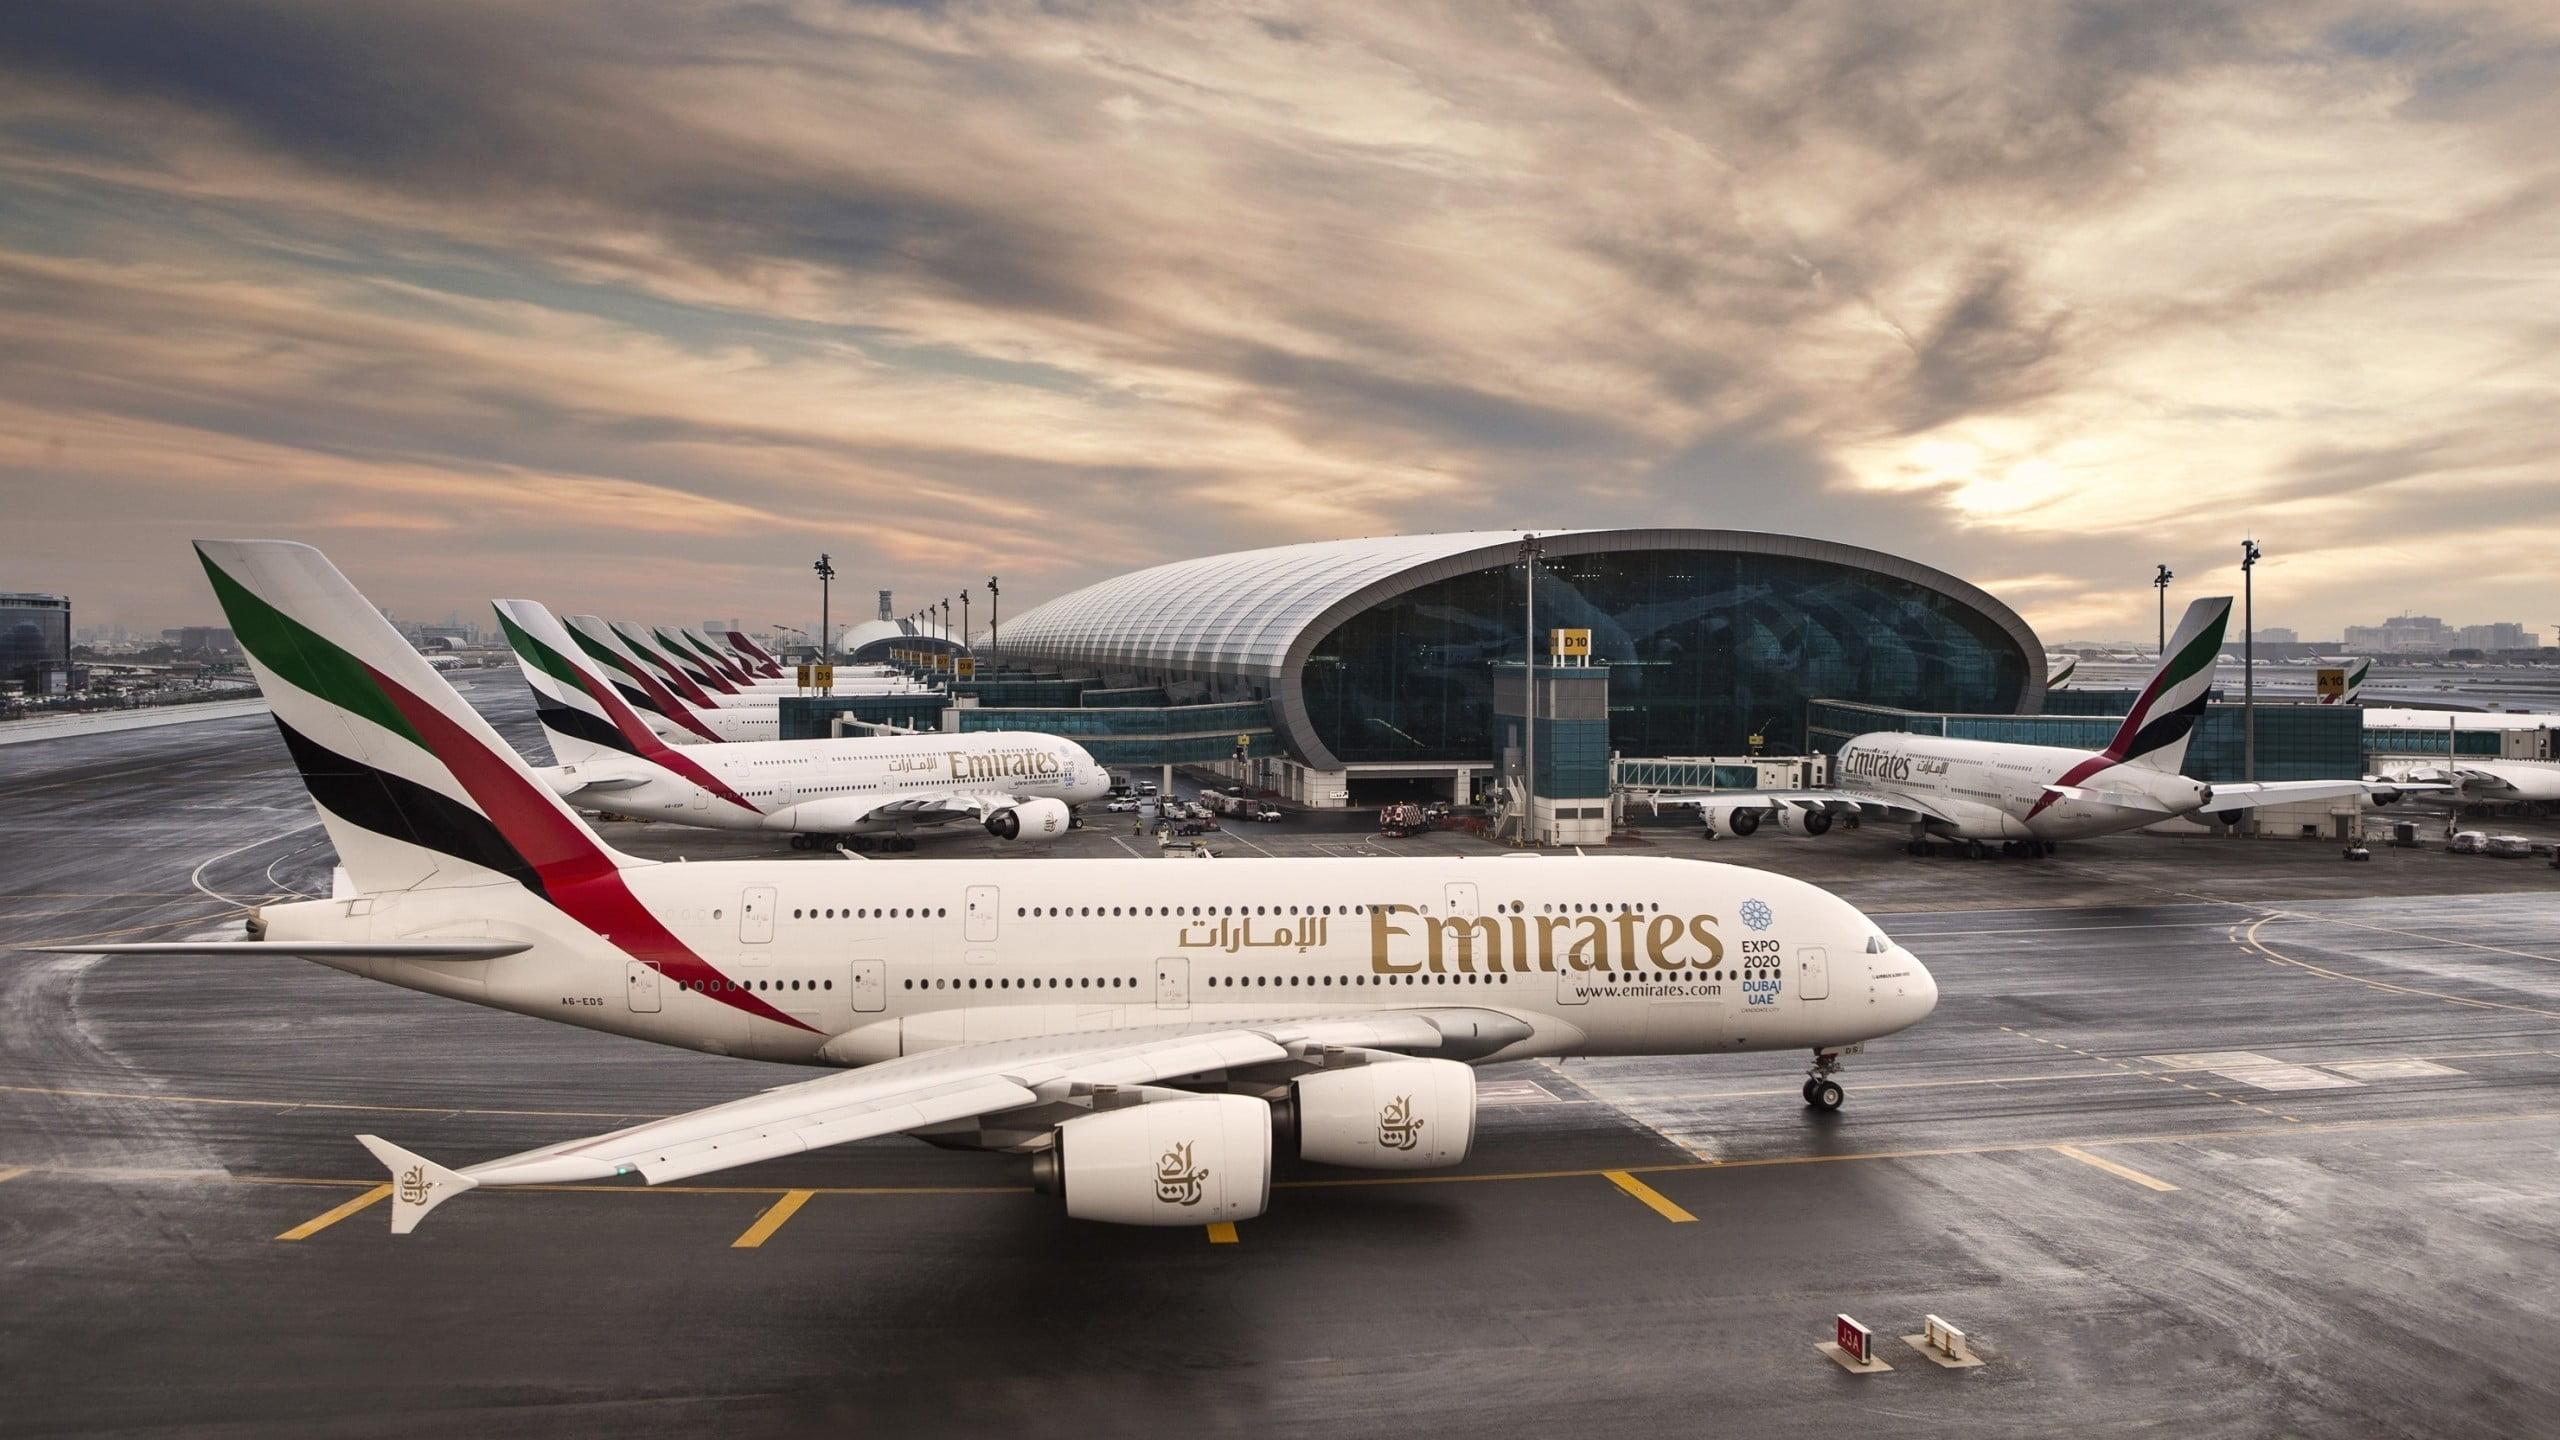 White Fly Emirates airplane on asphalt road HD wallpaper 2560x1440